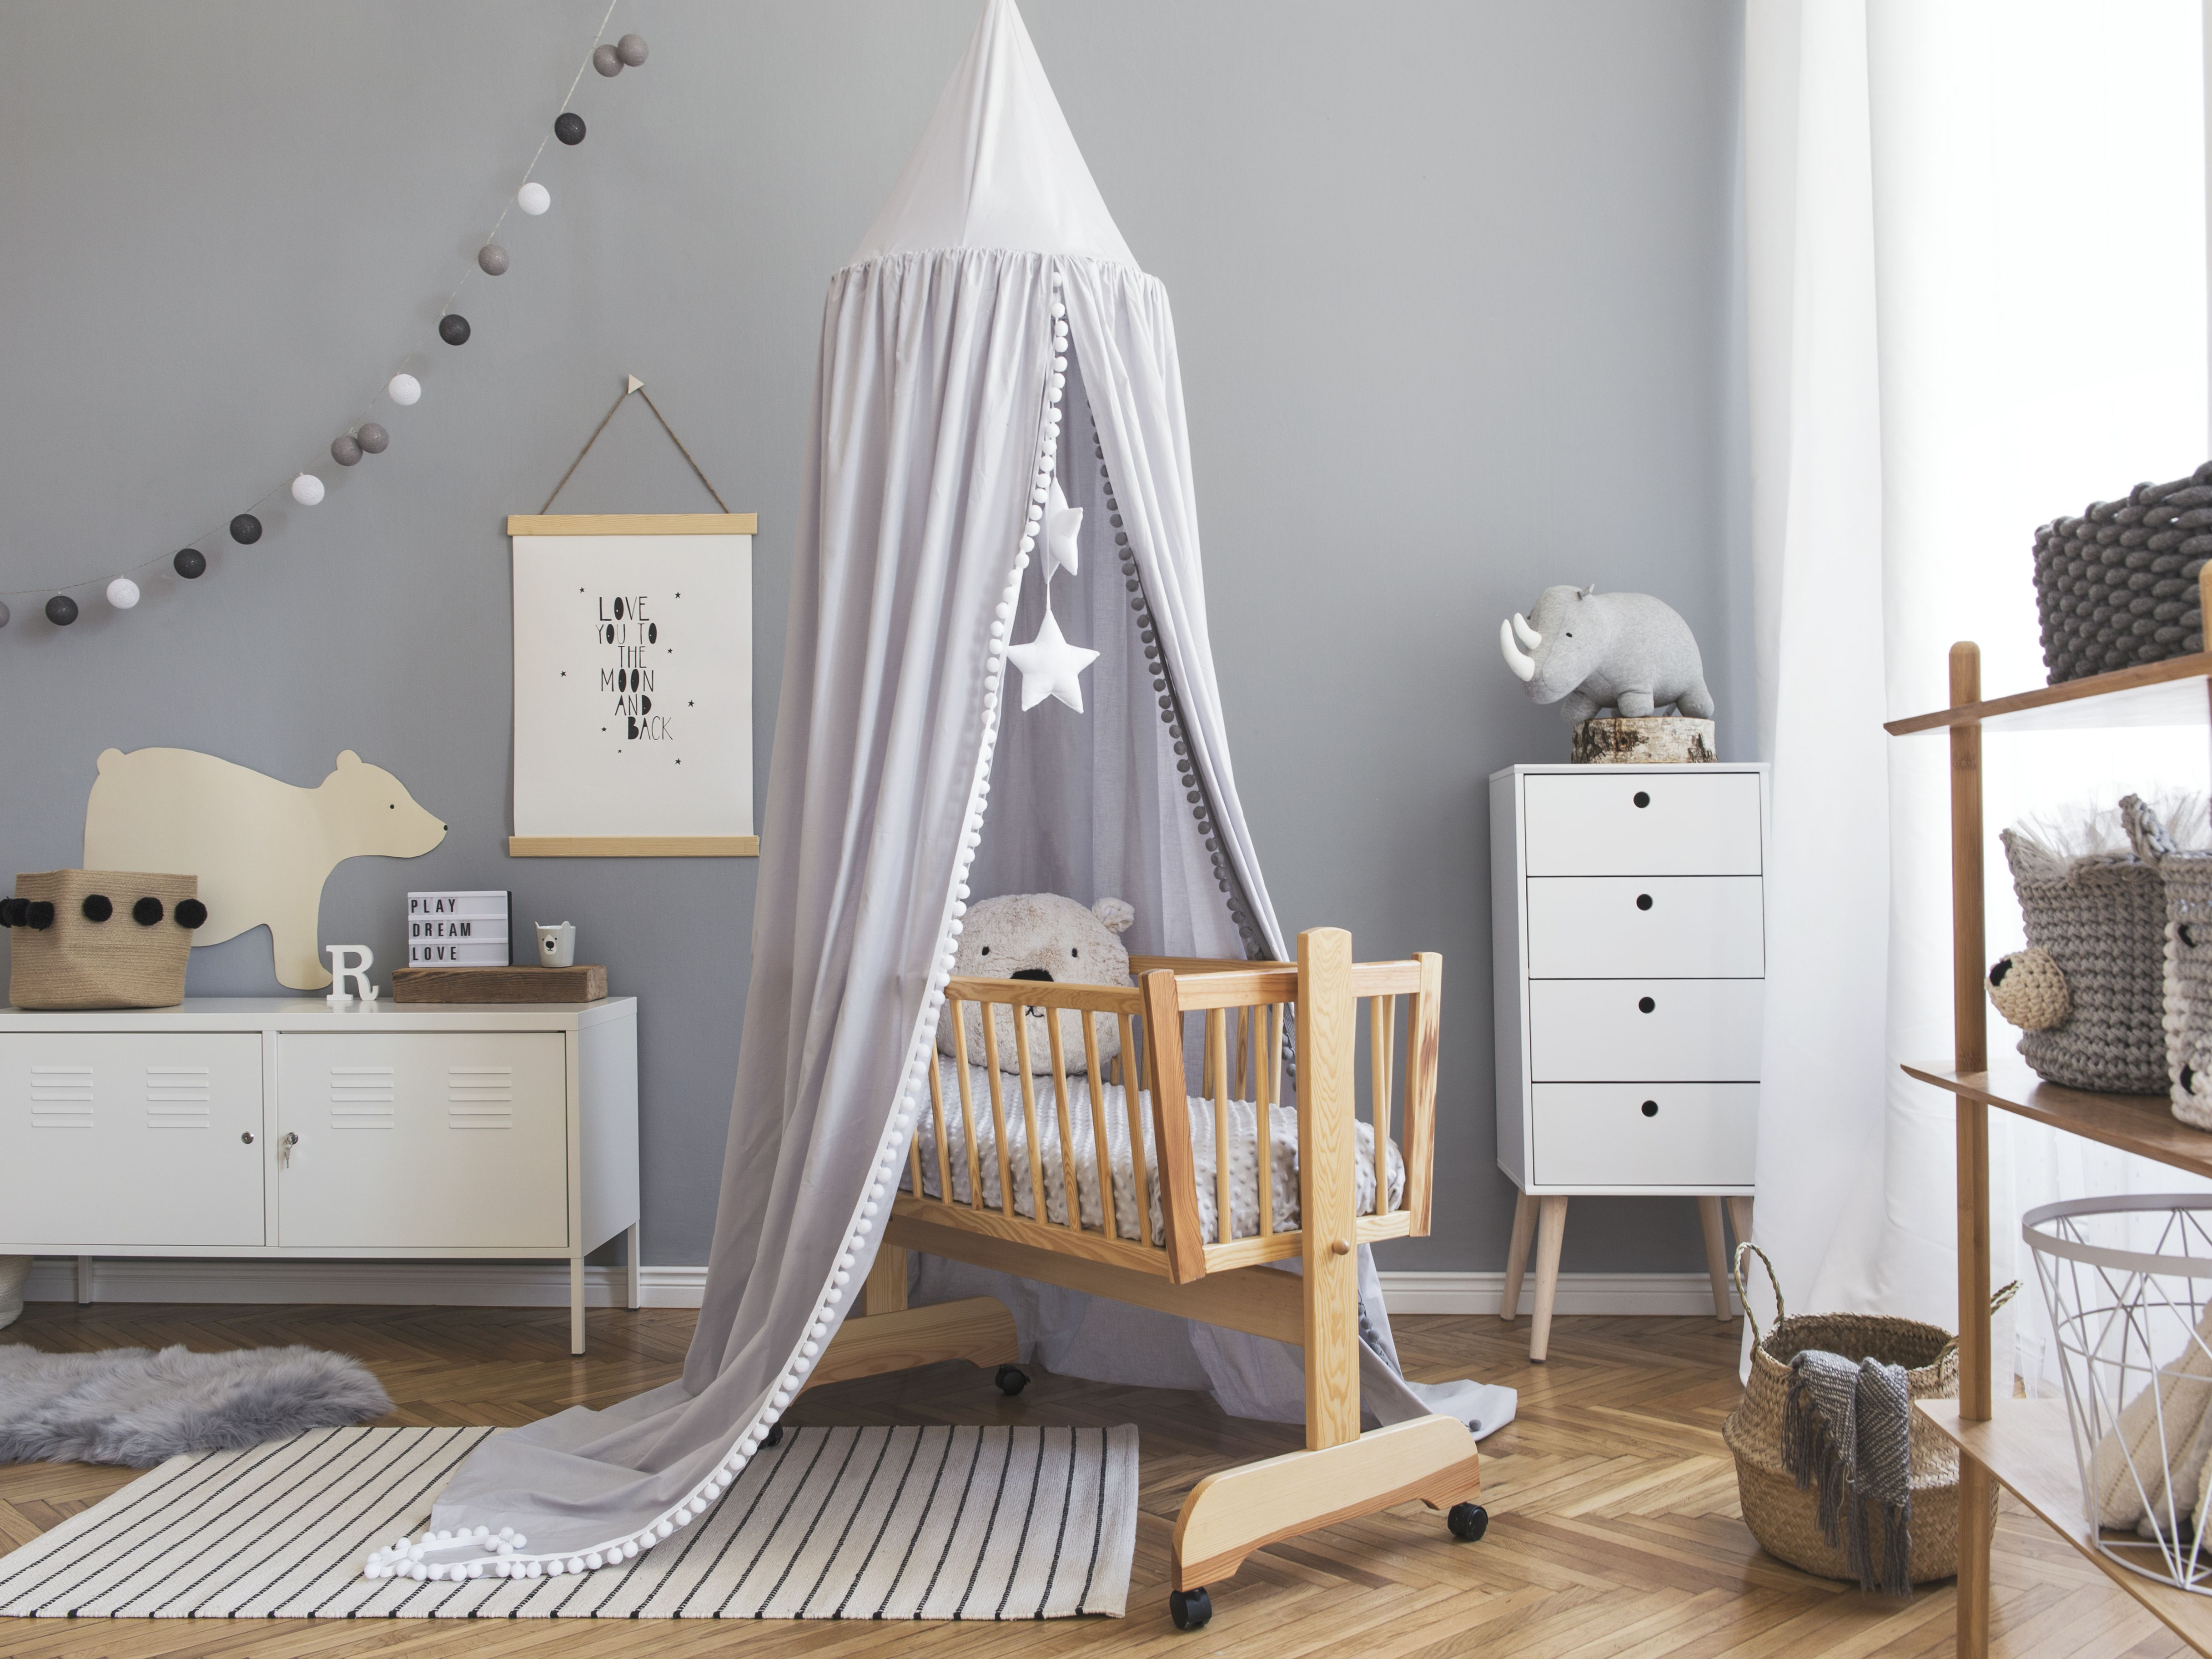 8 Best Paint Colors For A Boy Nursery